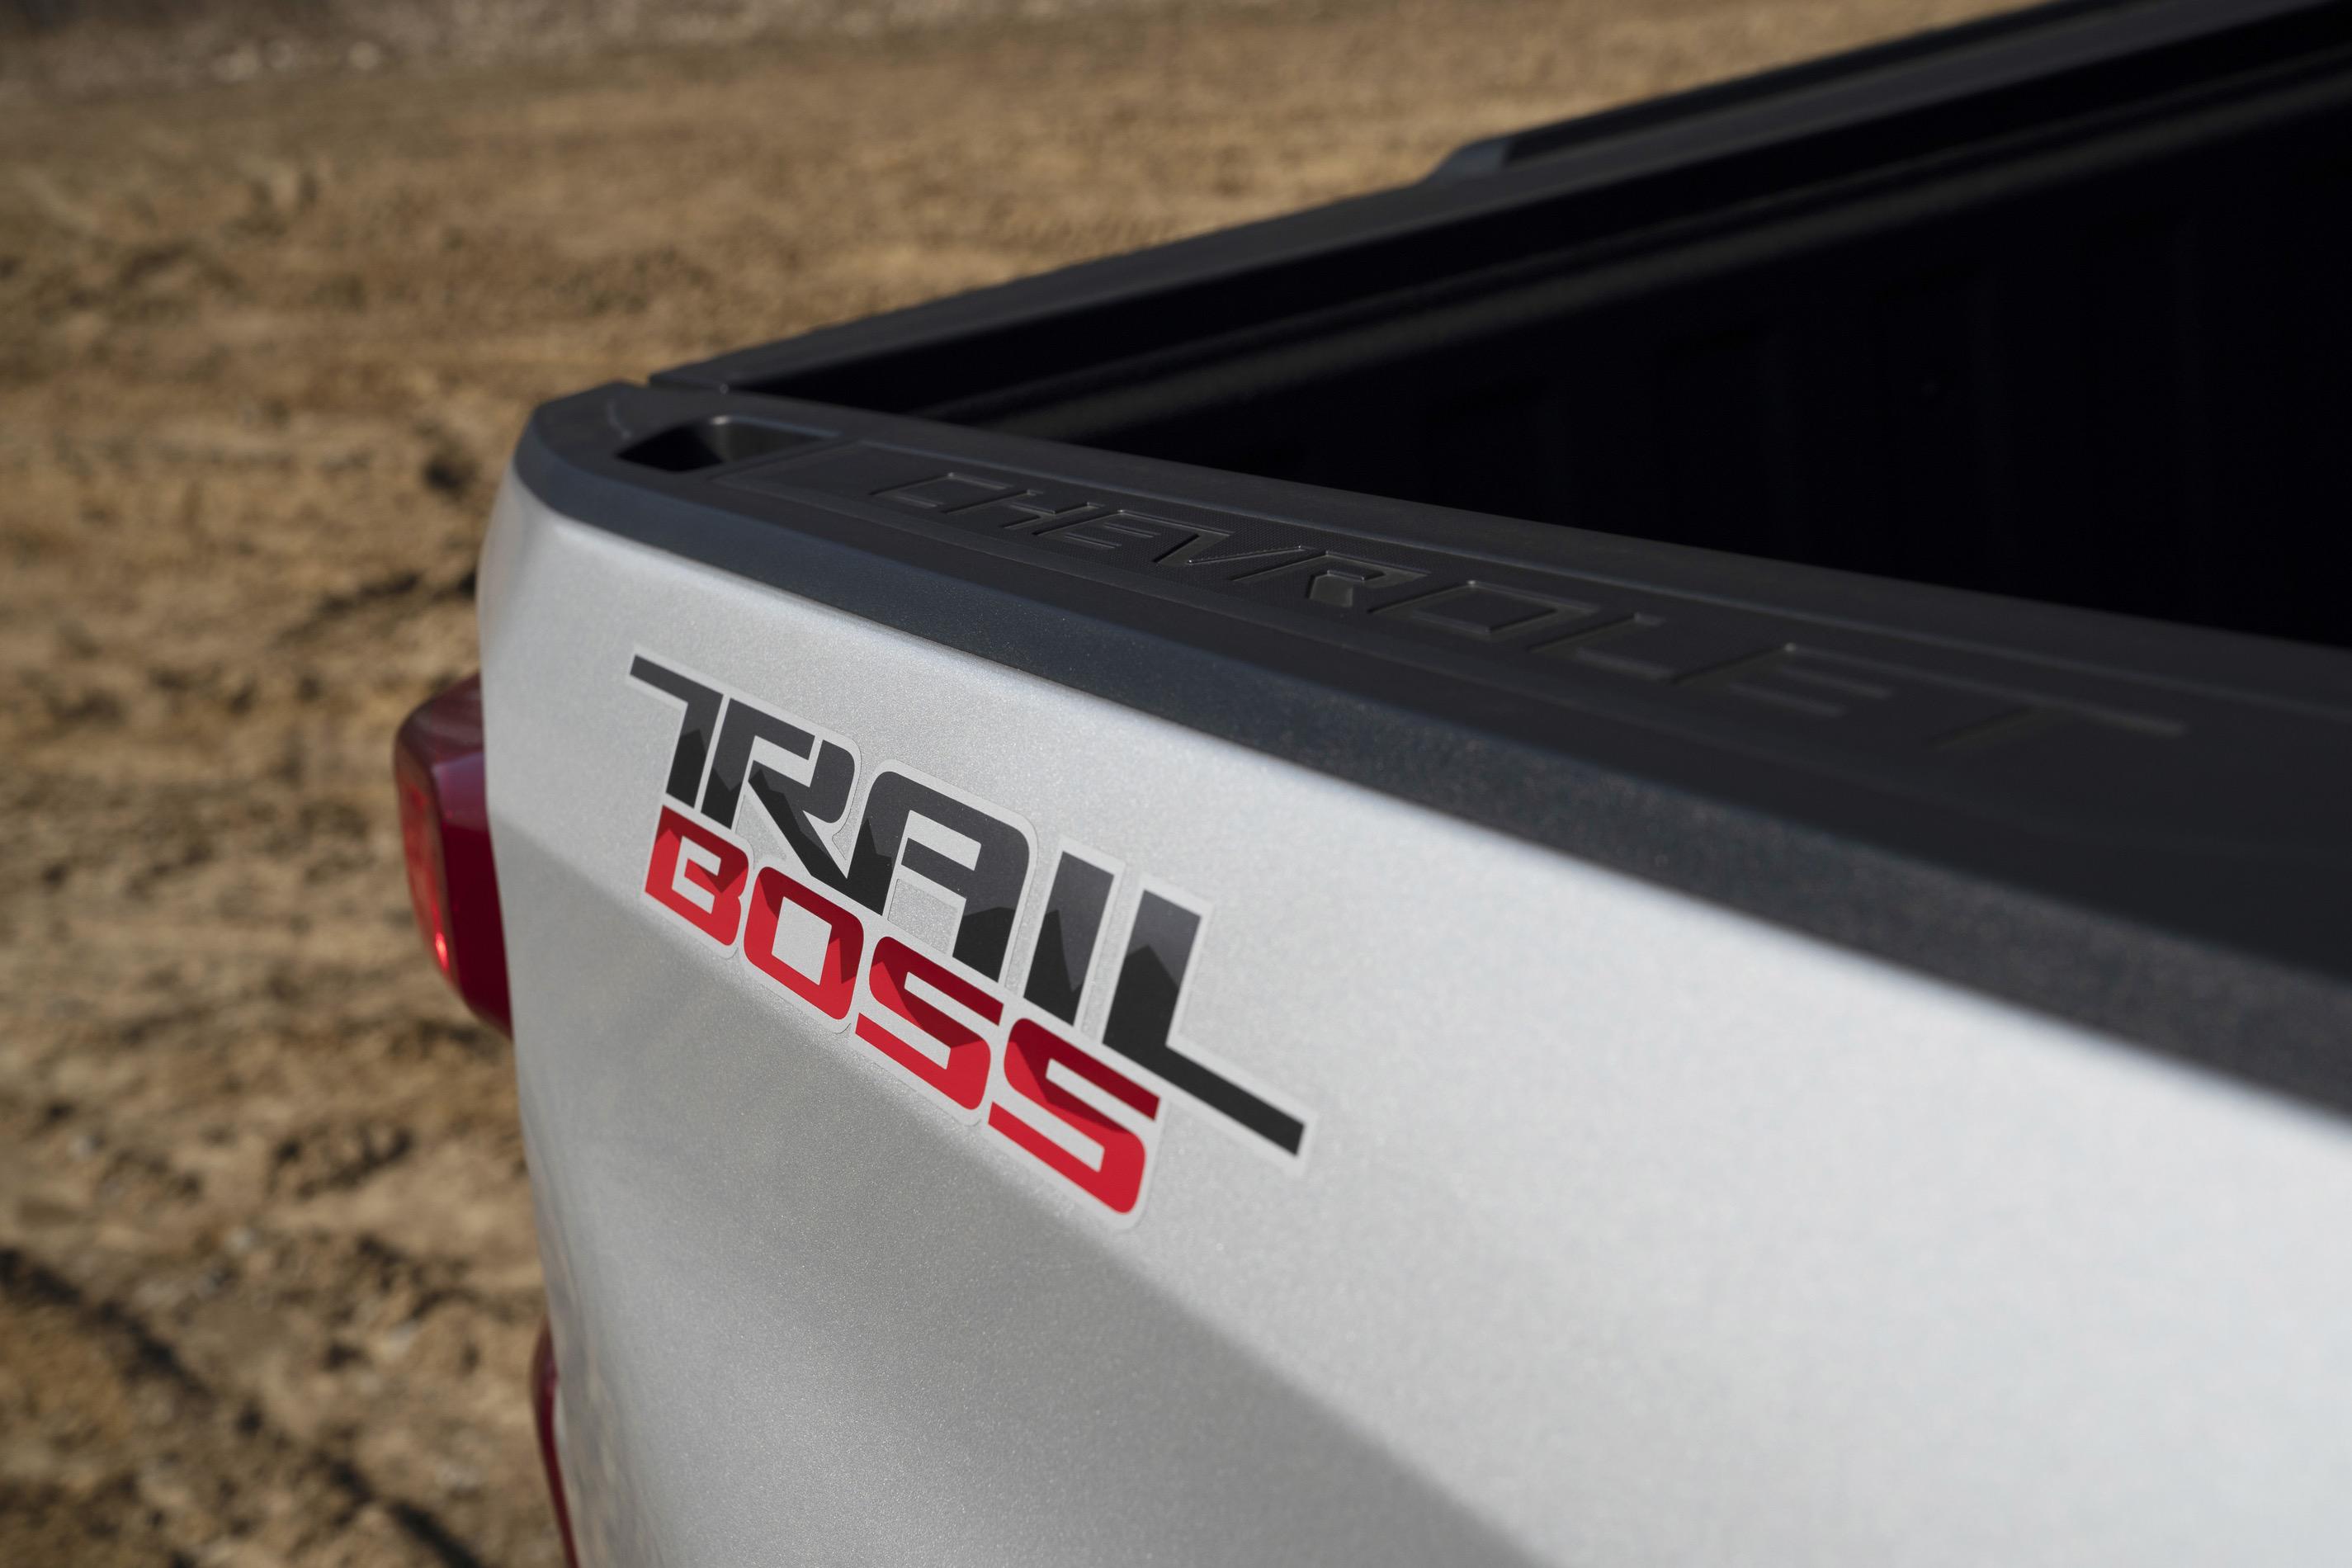 2020 Chevrolet Silverado Custom Trail Boss logo on truck